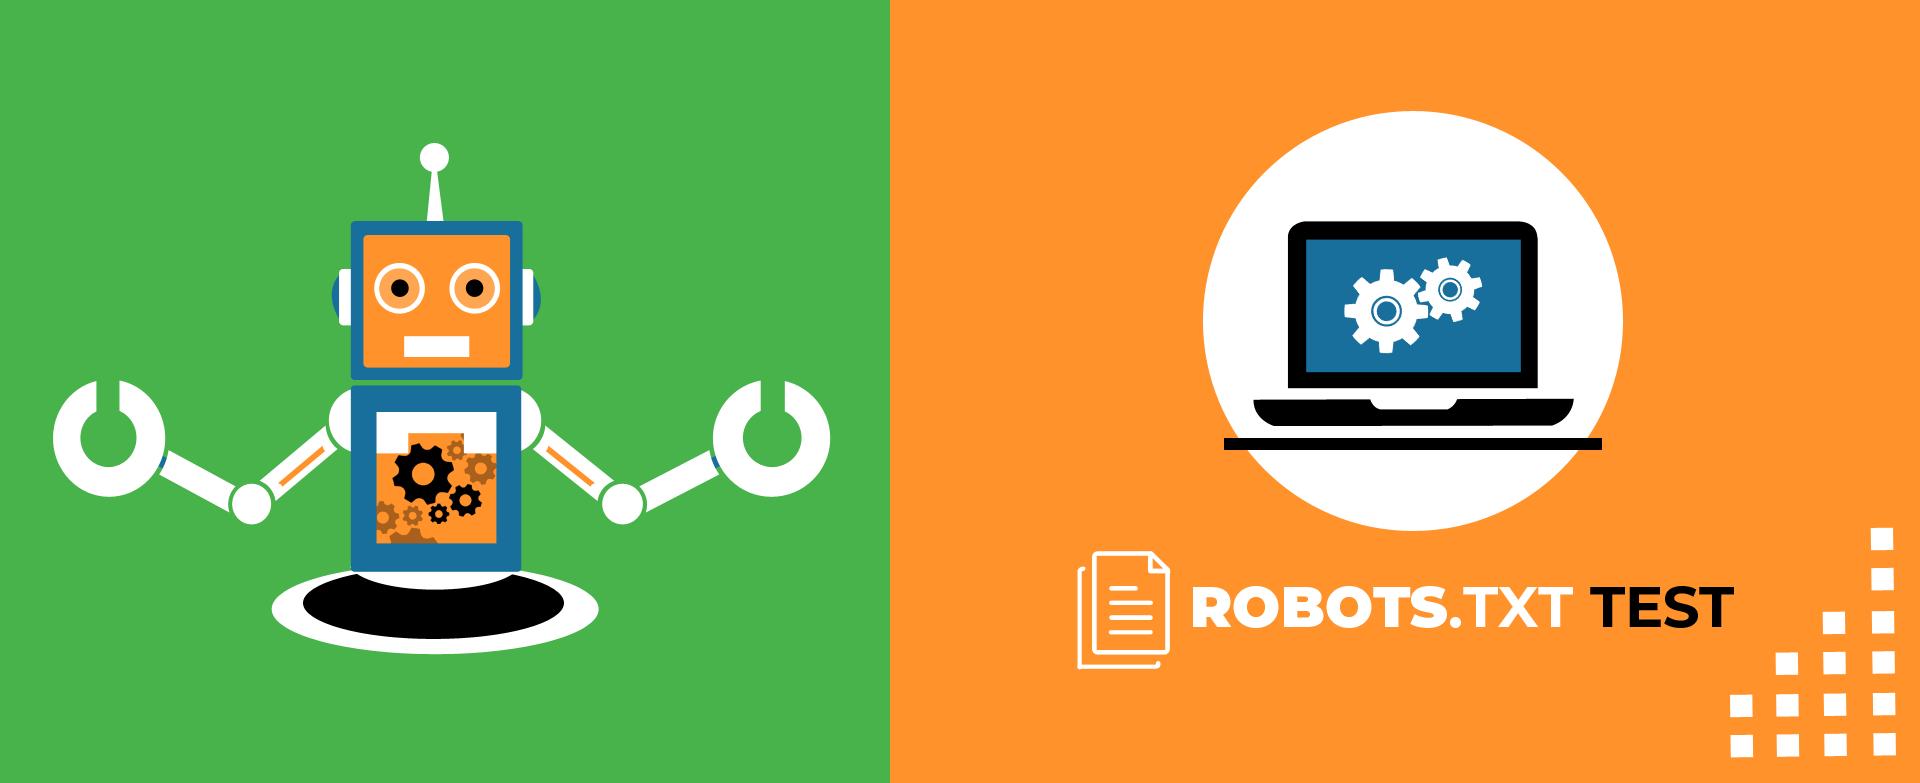 Free Robot.txt Checker & Generator